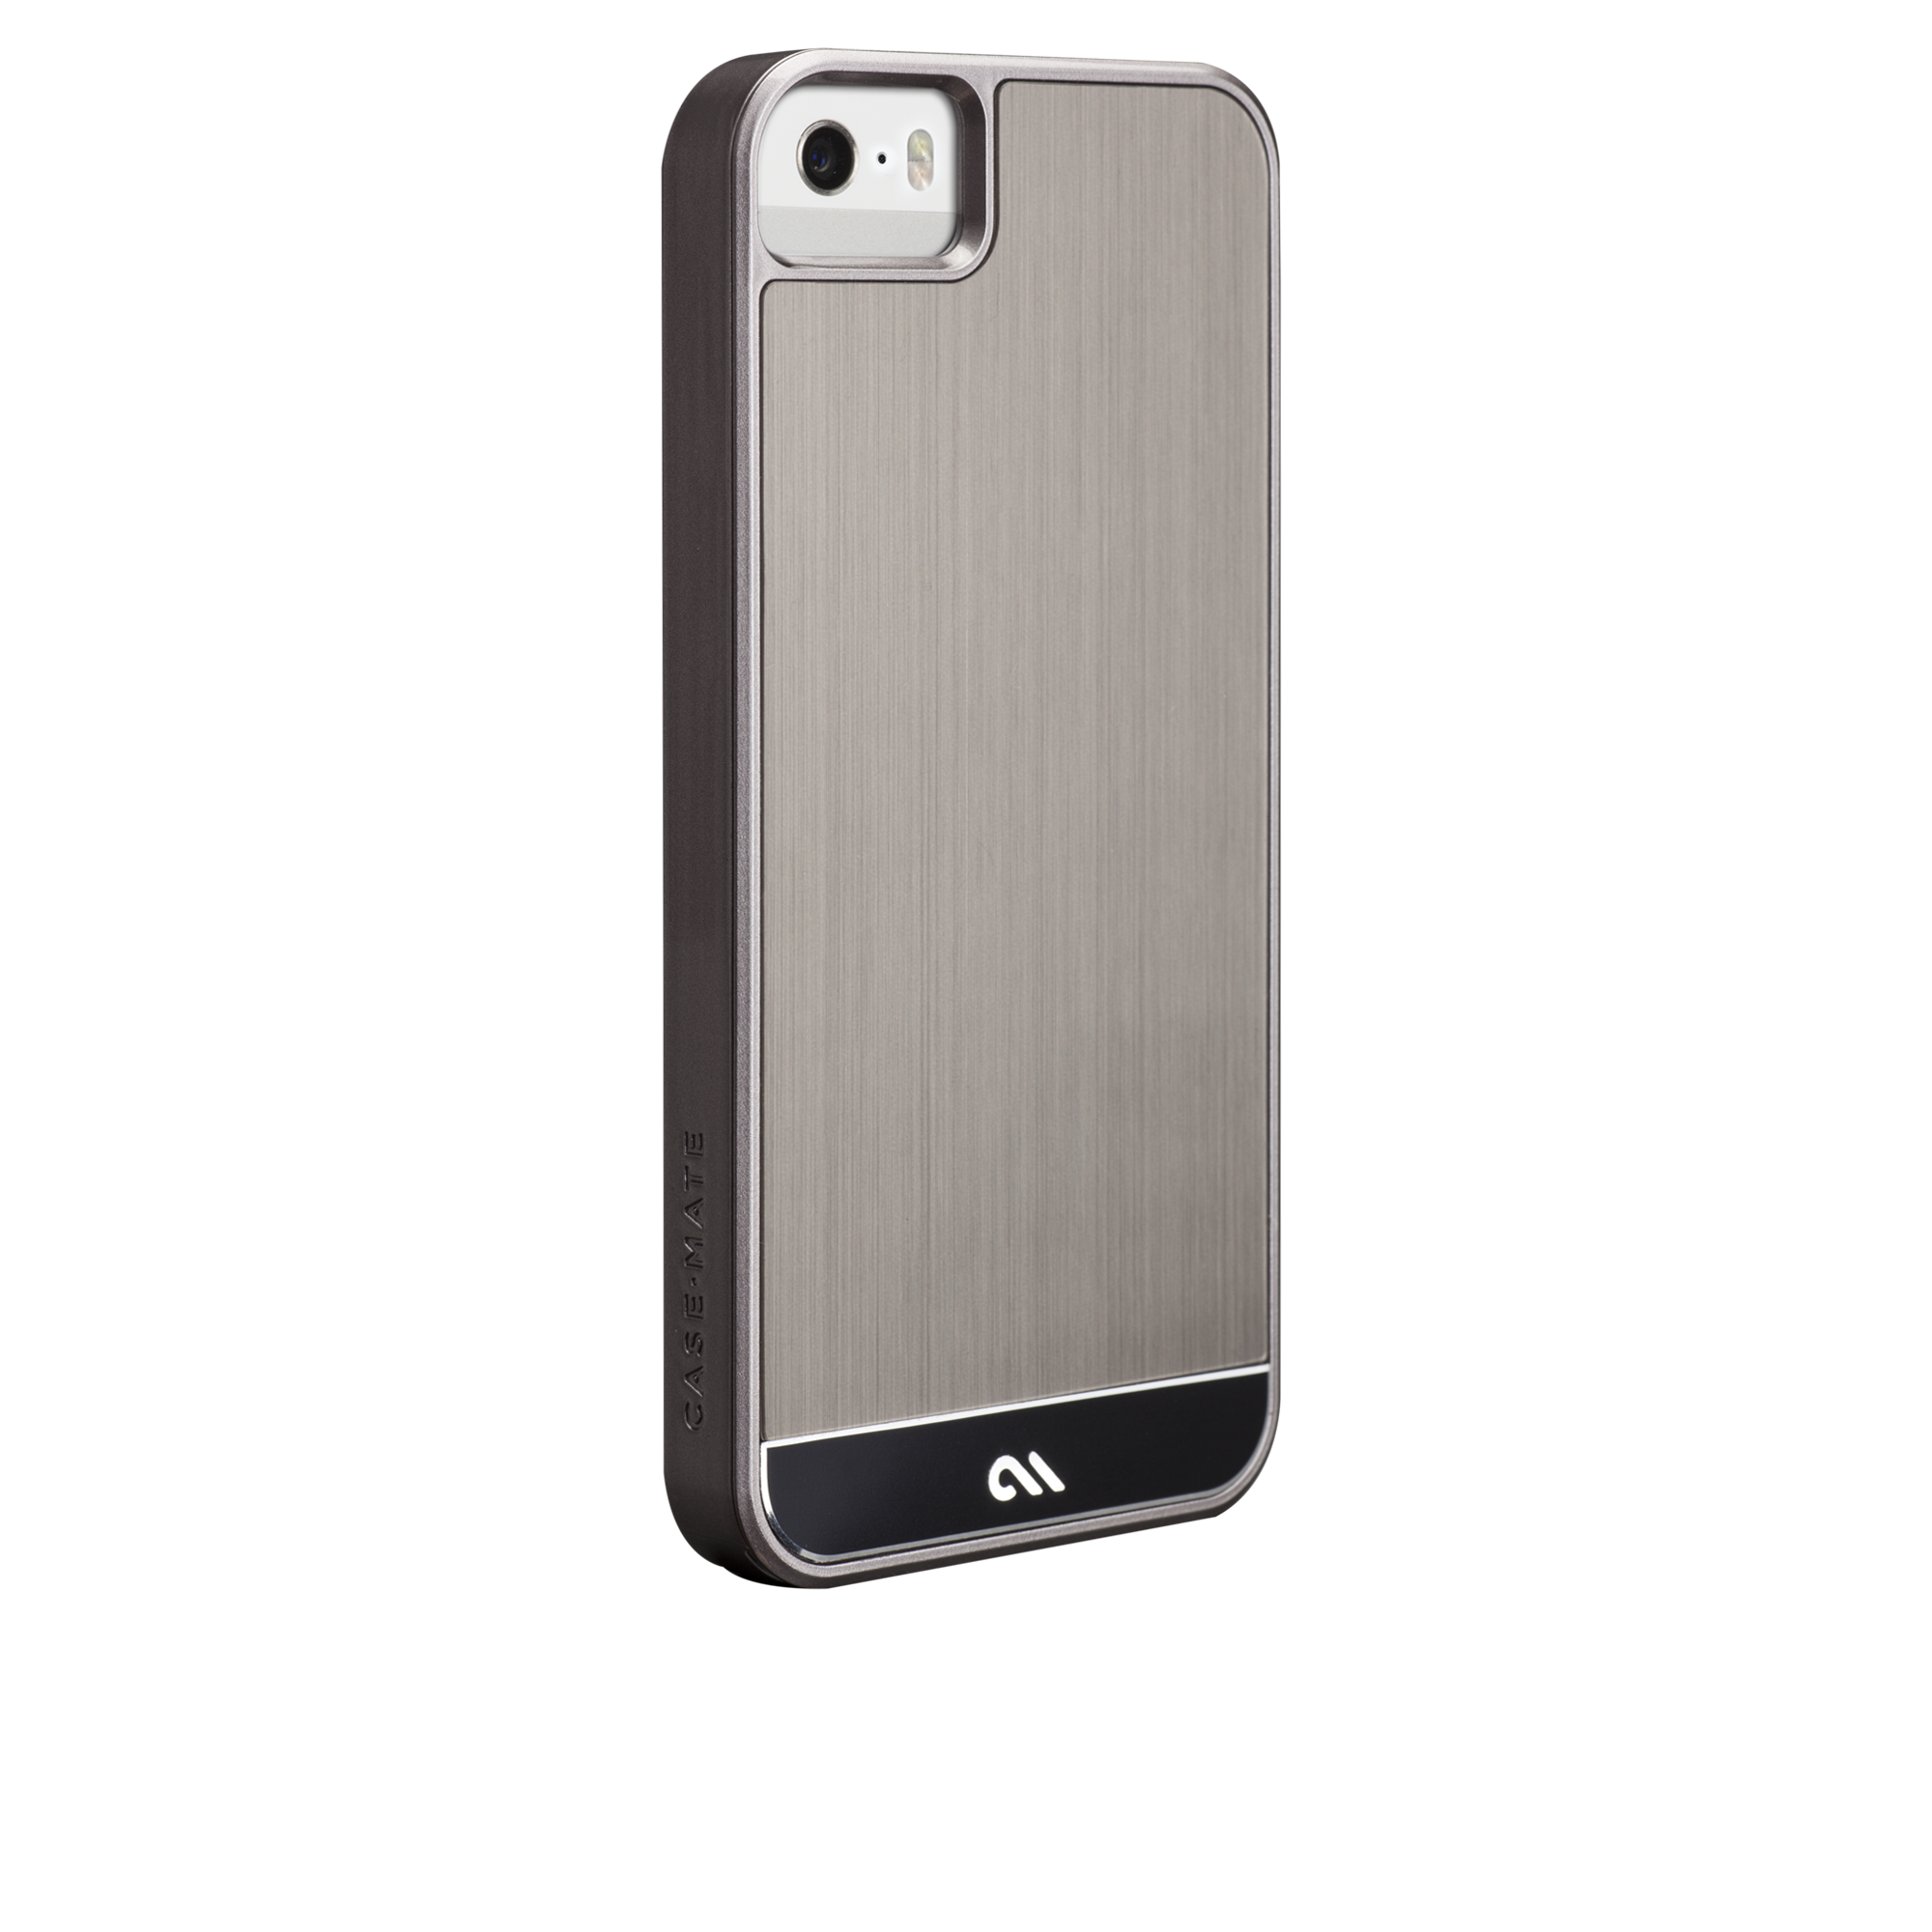 Brushed Aluminum Case - Gunmetal & Black